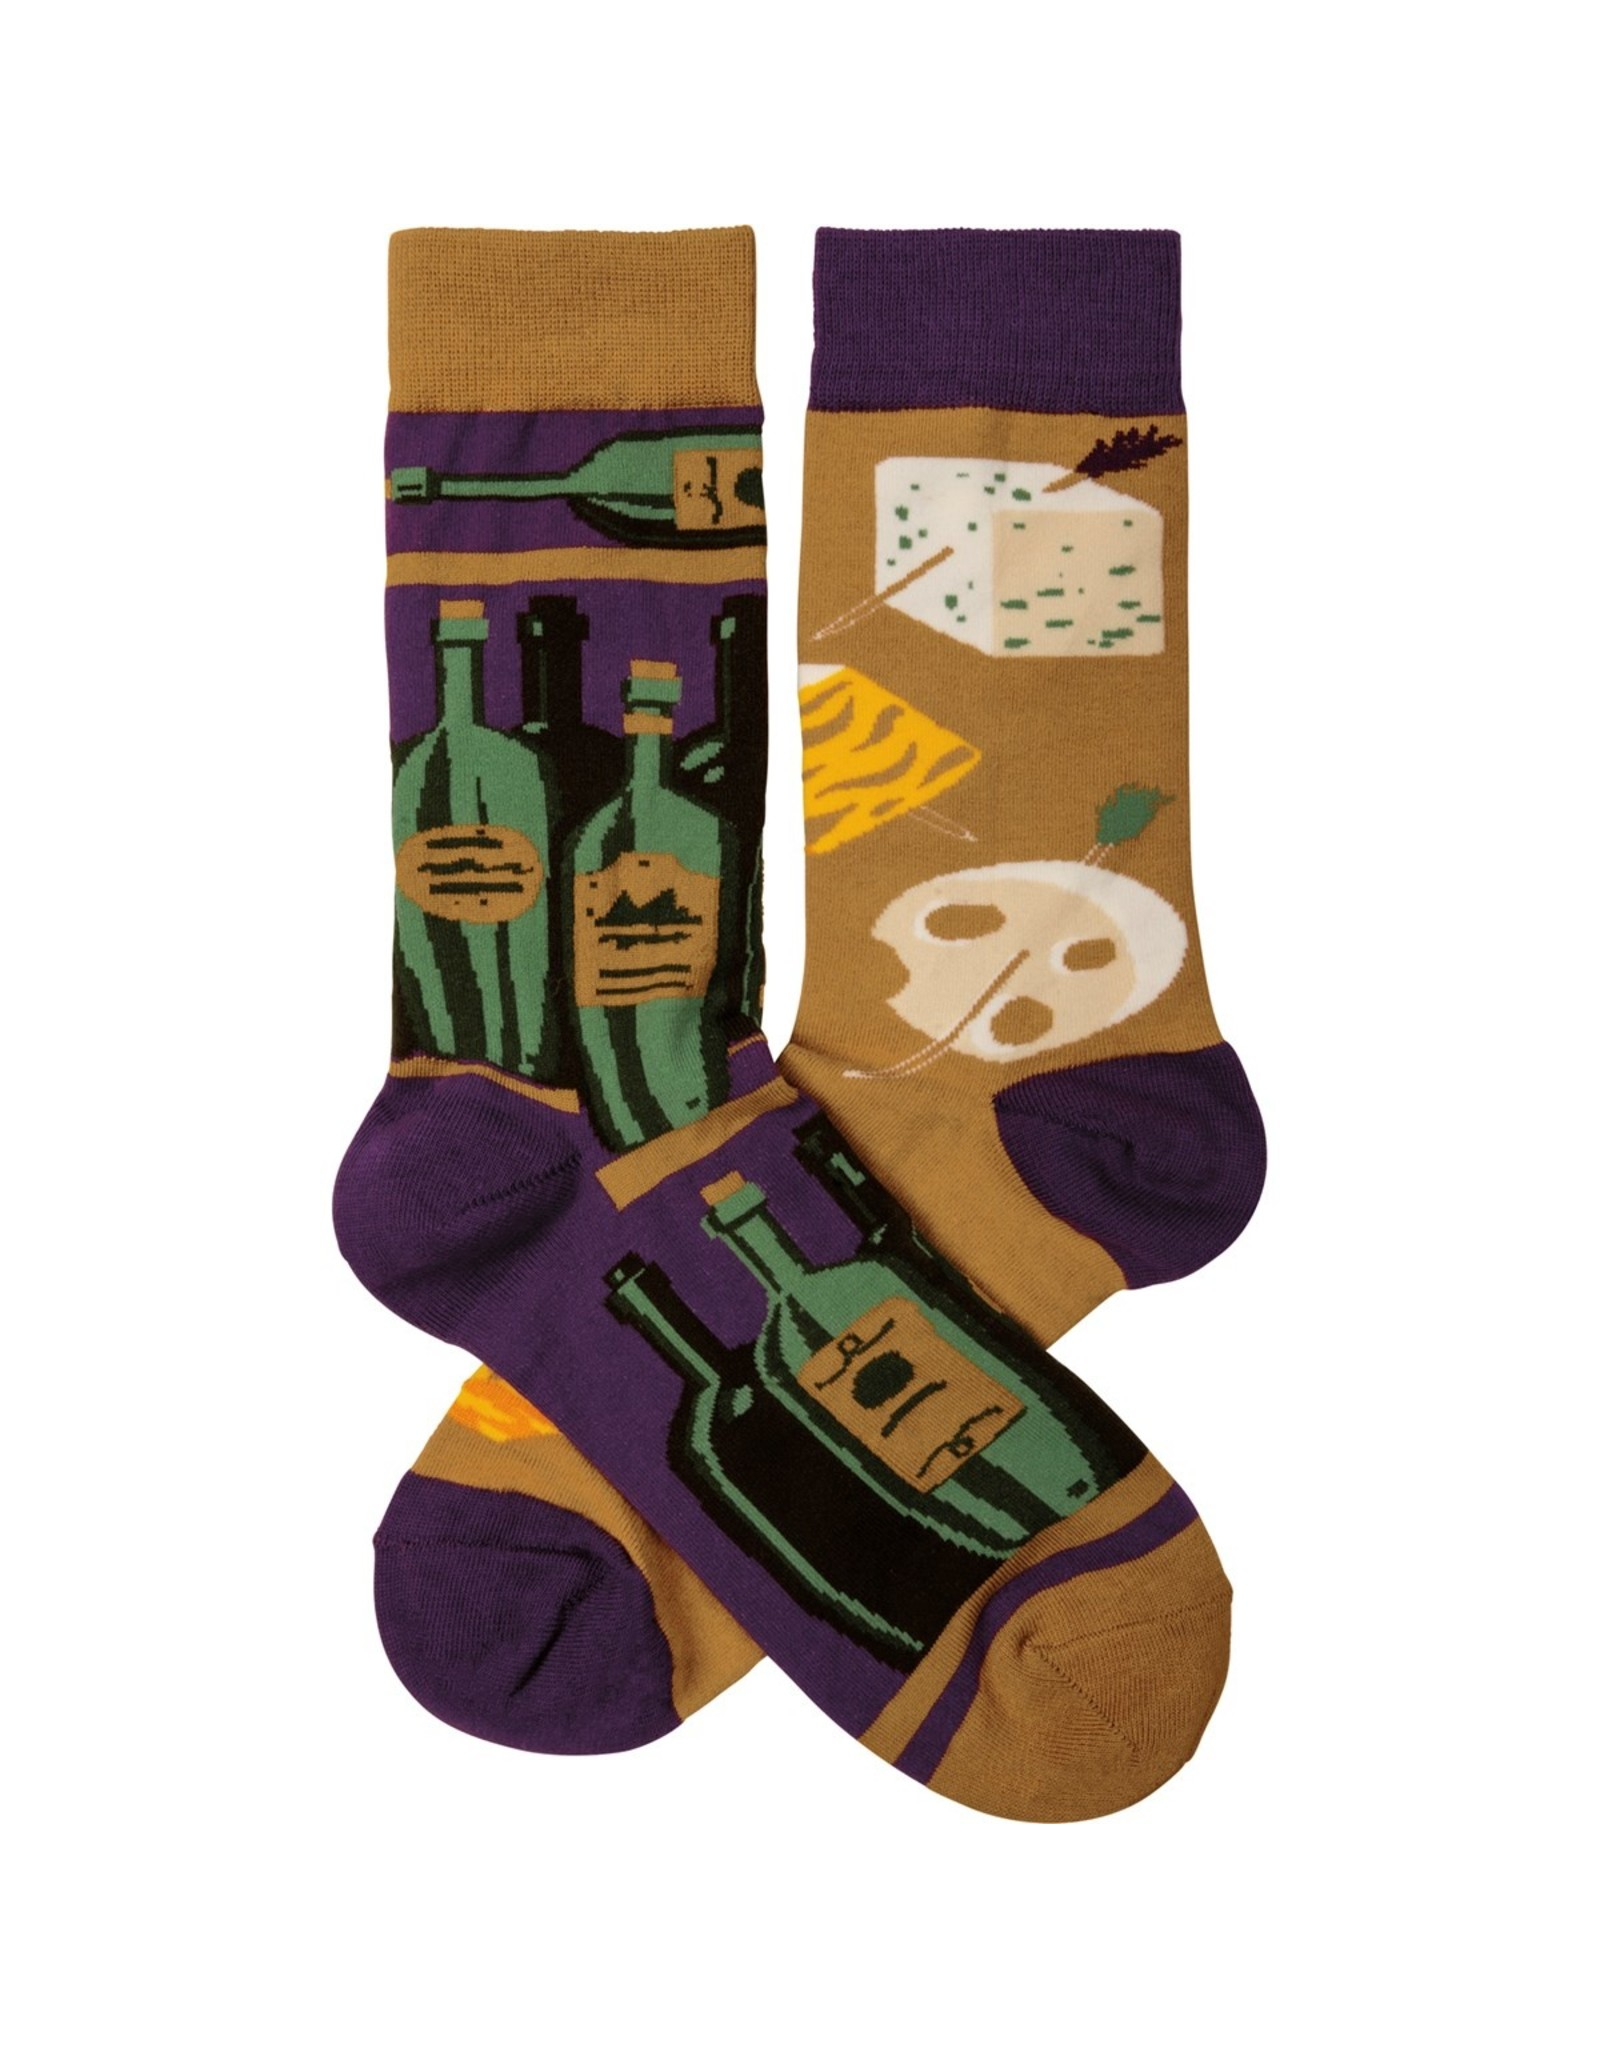 Socks, Wine & Cheese